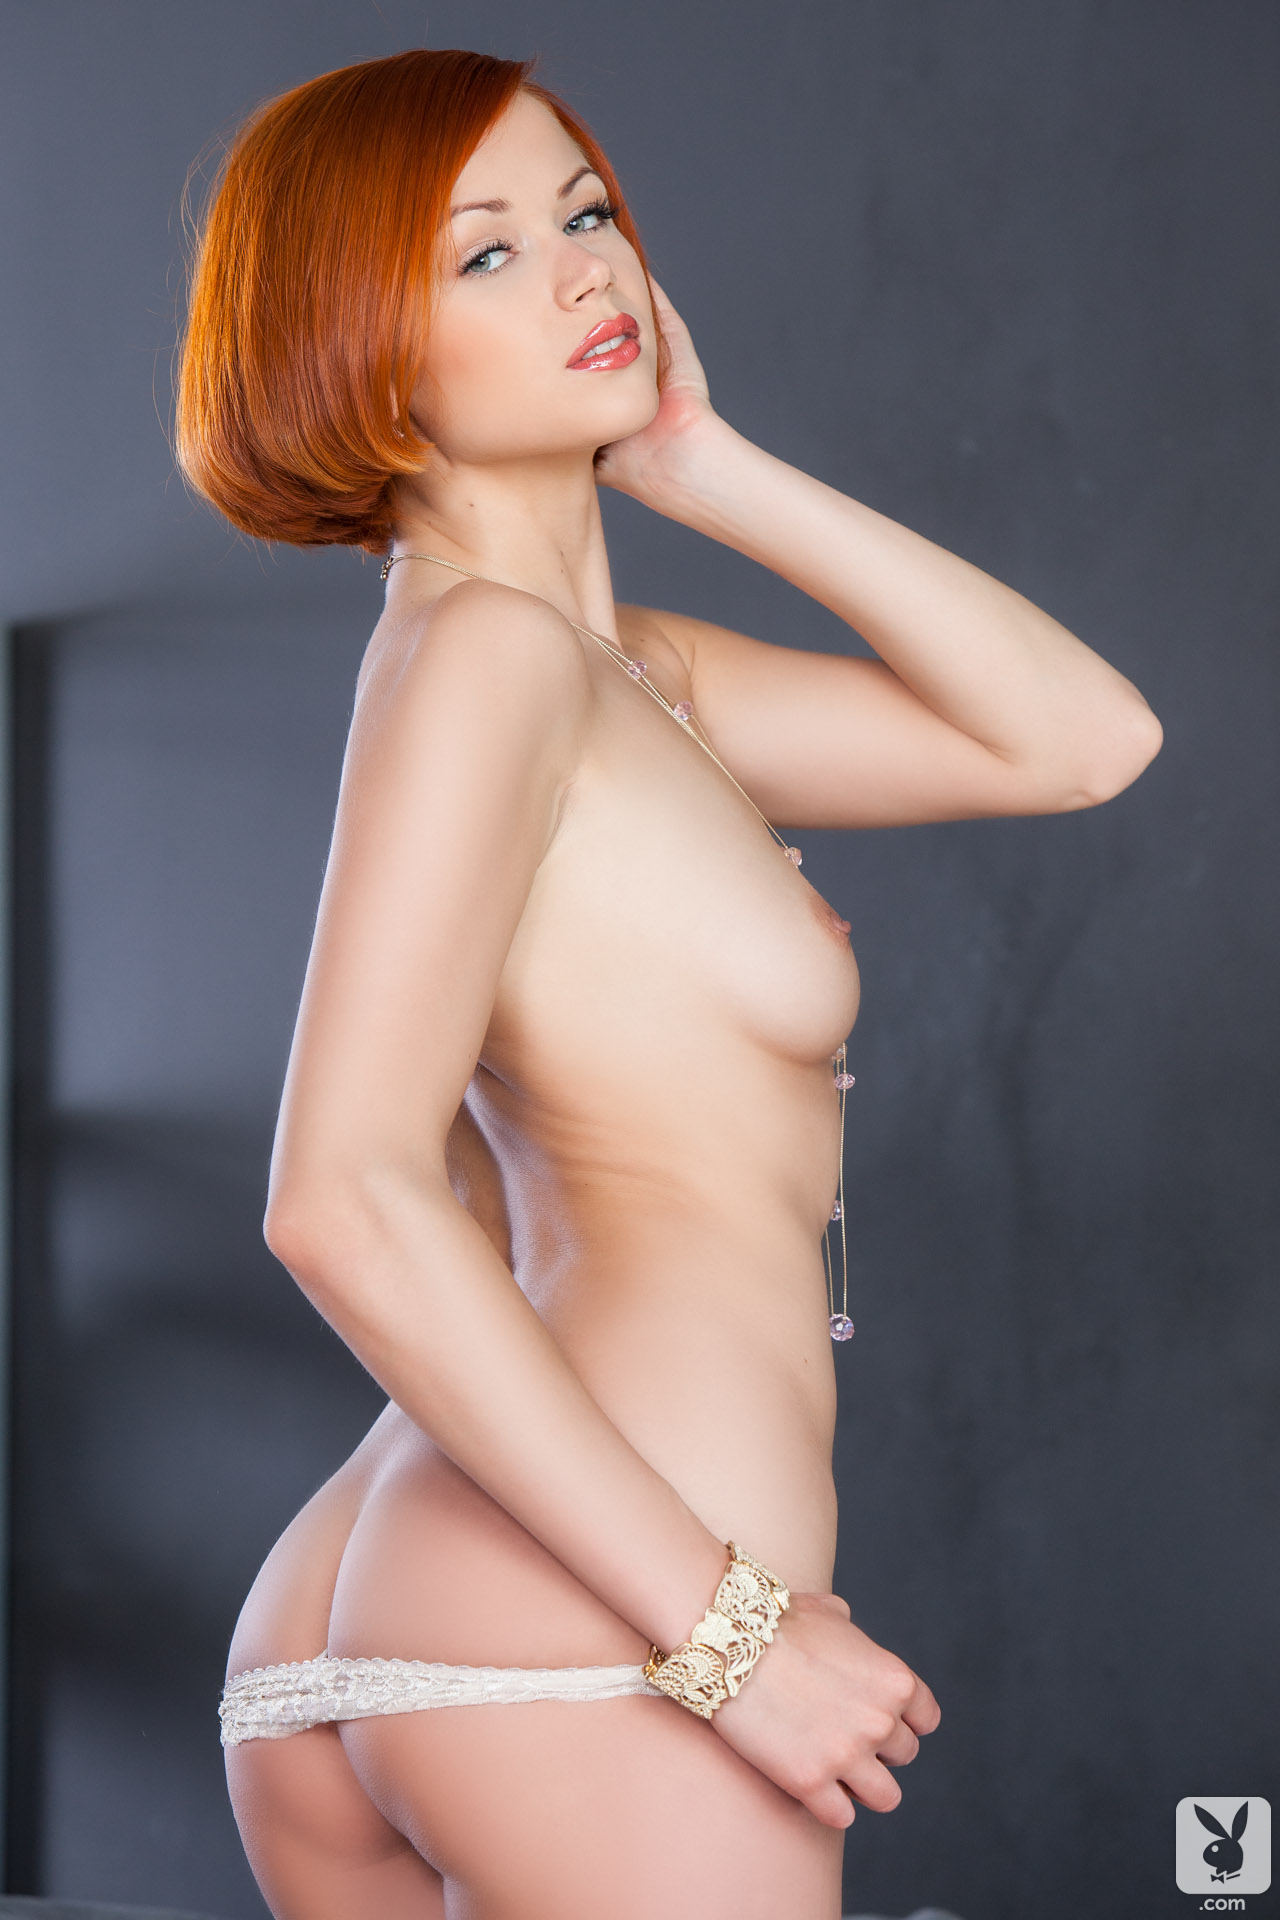 kamila-hermanova-redhead-naked-white-lingerie-playboy-18